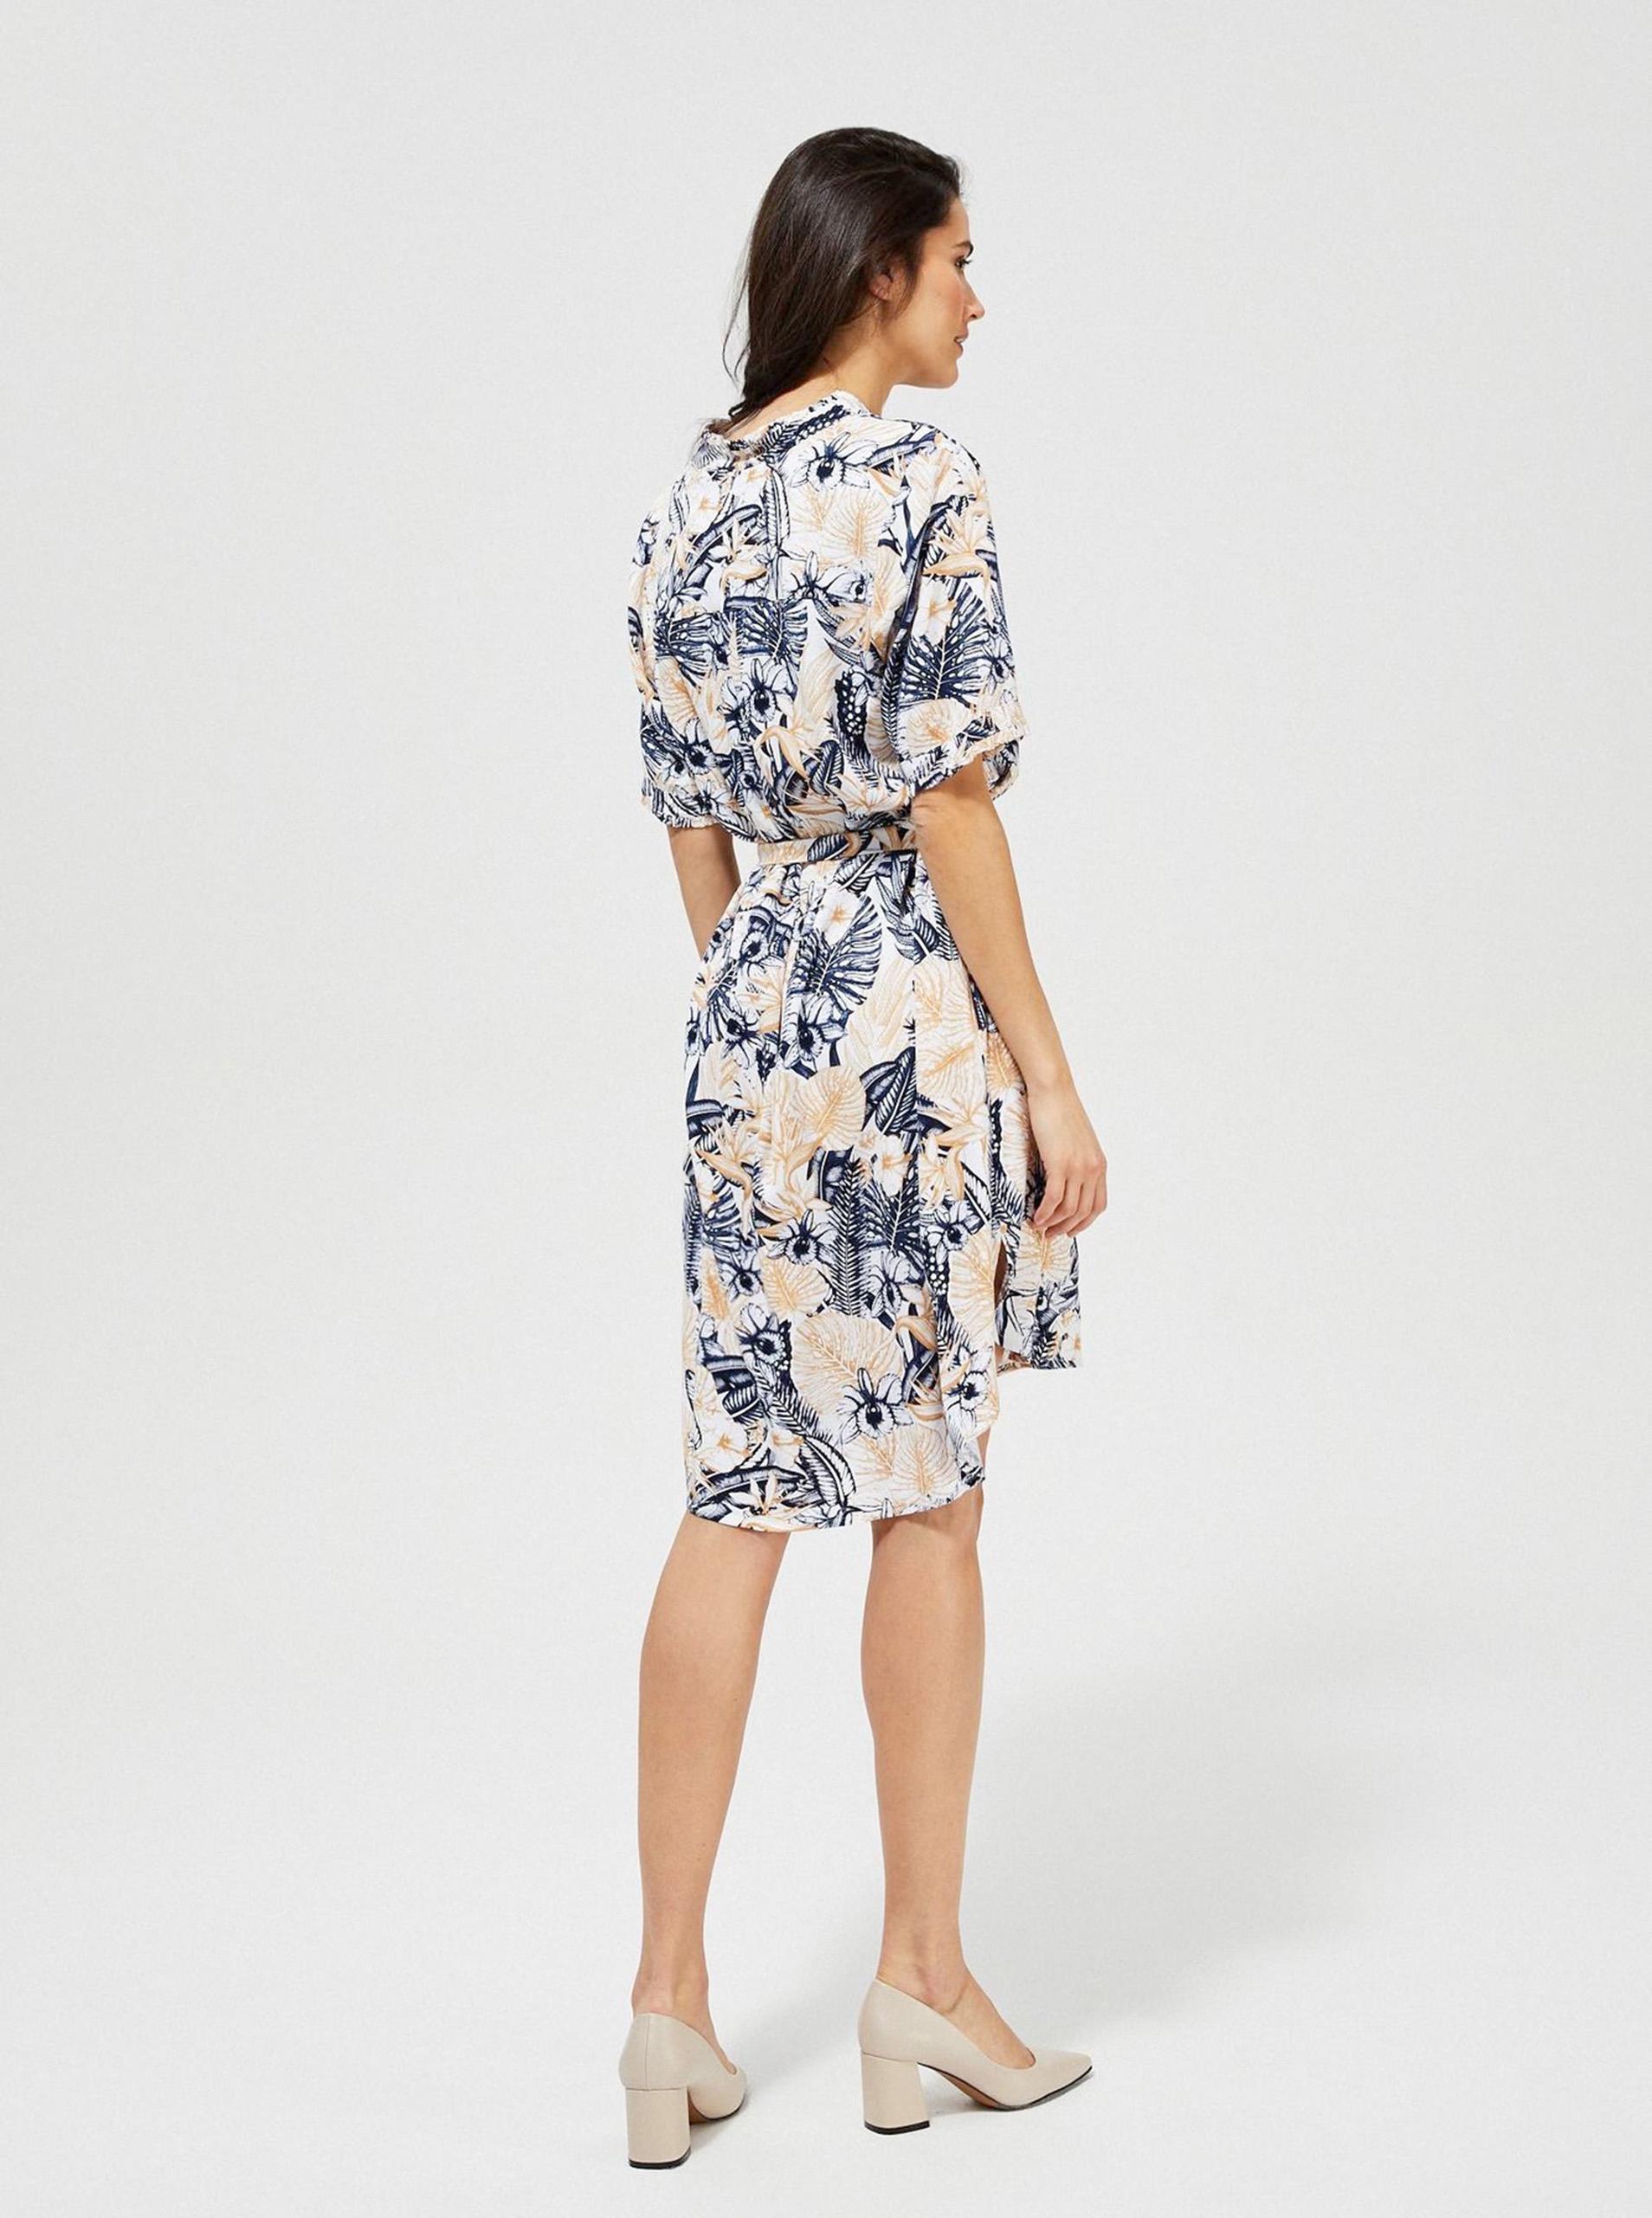 Moodo cream / cream flowered dress